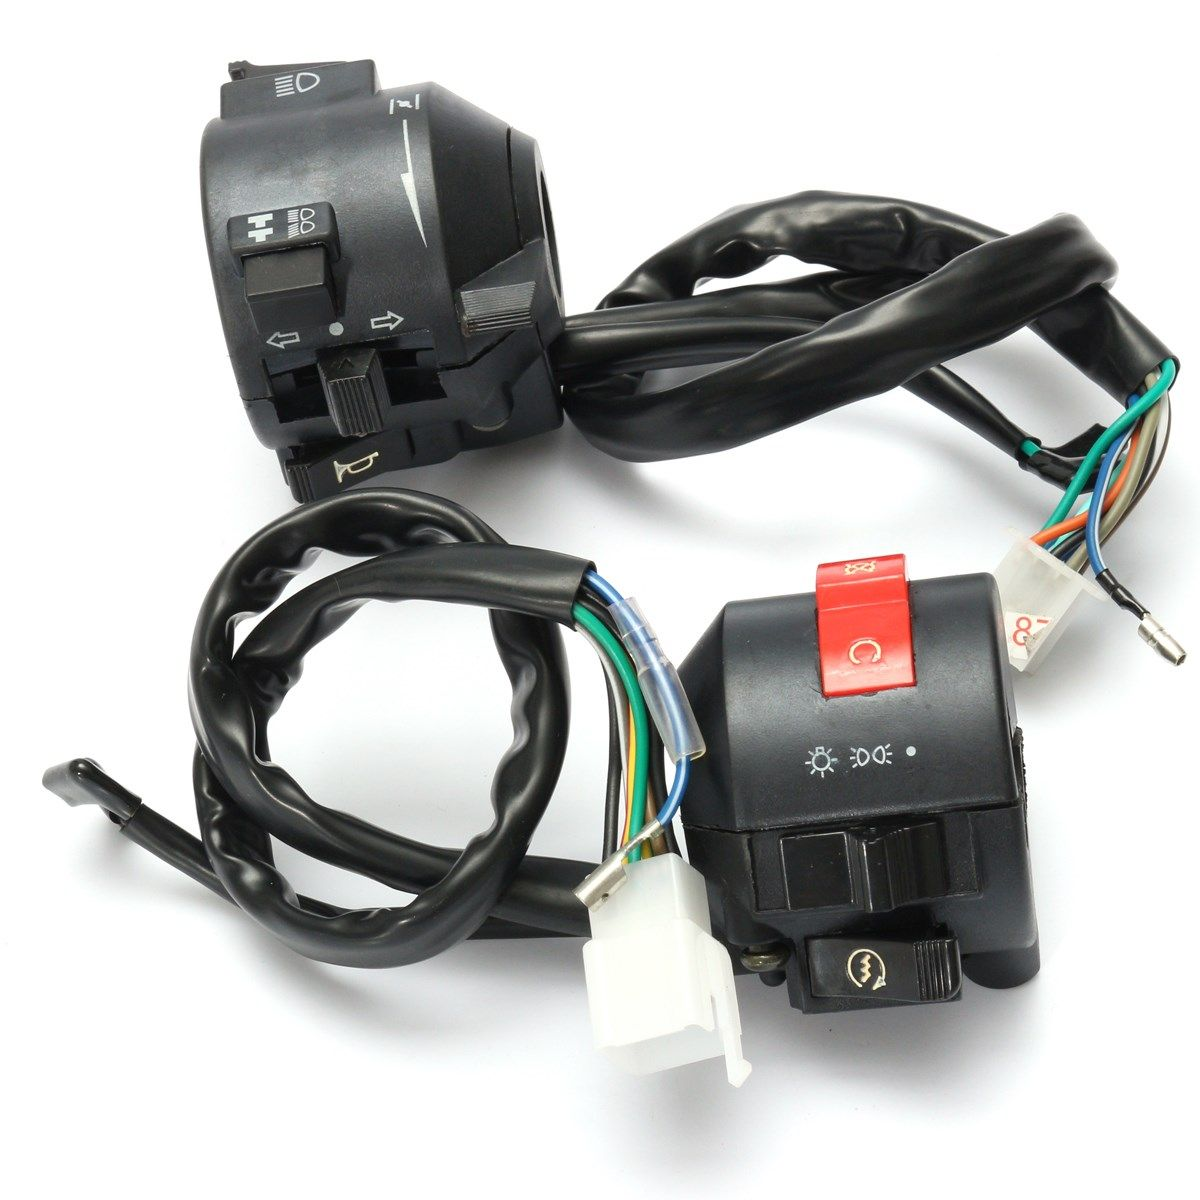 Black Motorcycle 7/8 Inch Handlebar Horn Turn Signal Switch Hi/Lo Beam Kill Light Start Switches Left Right